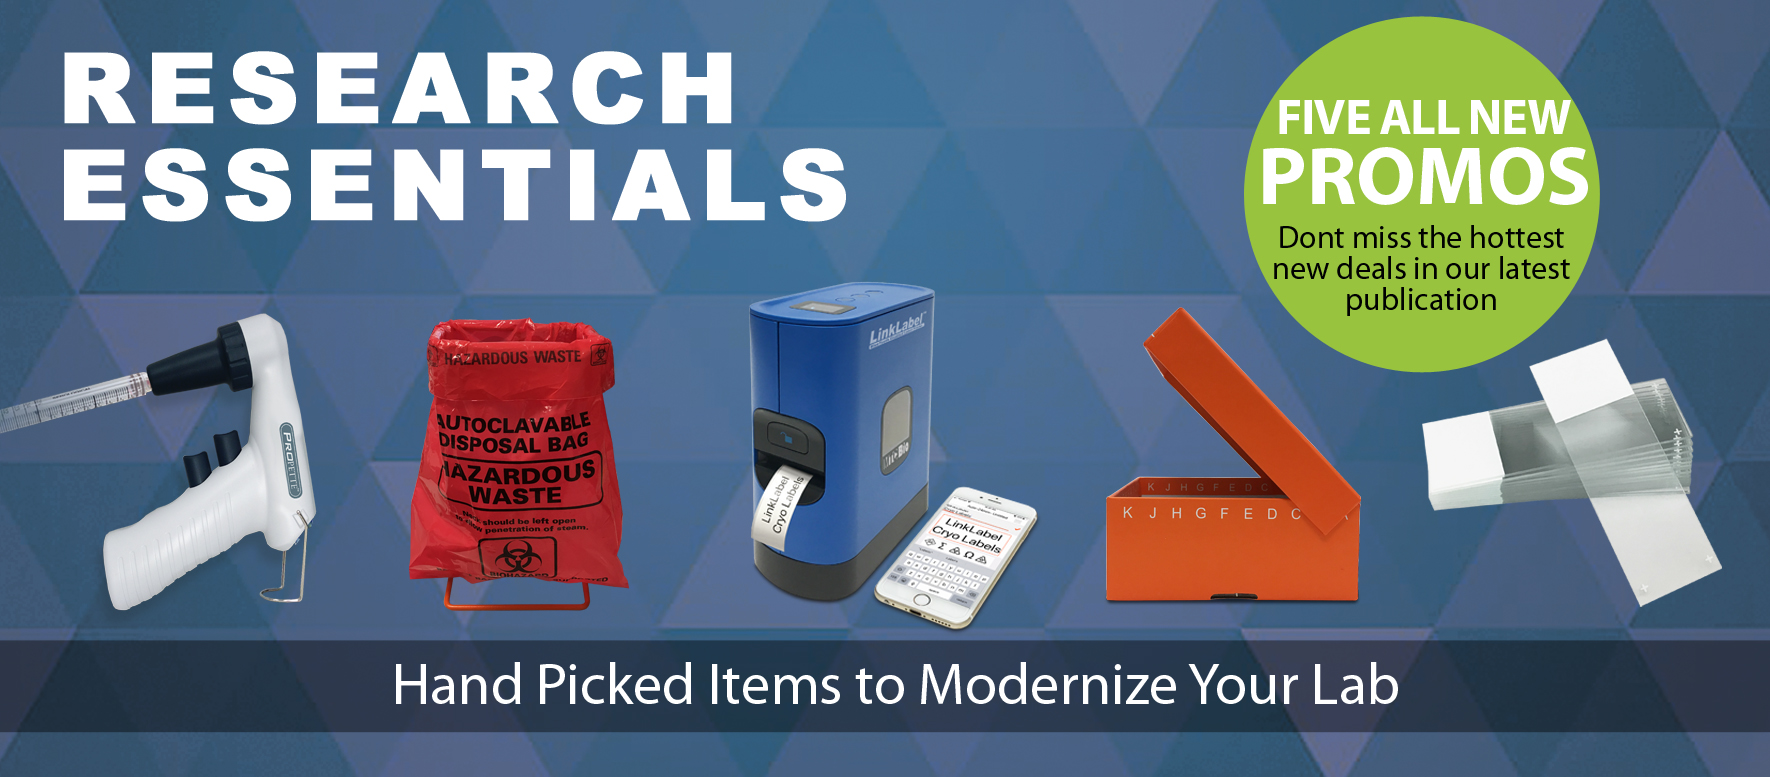 Research Essentials Promo